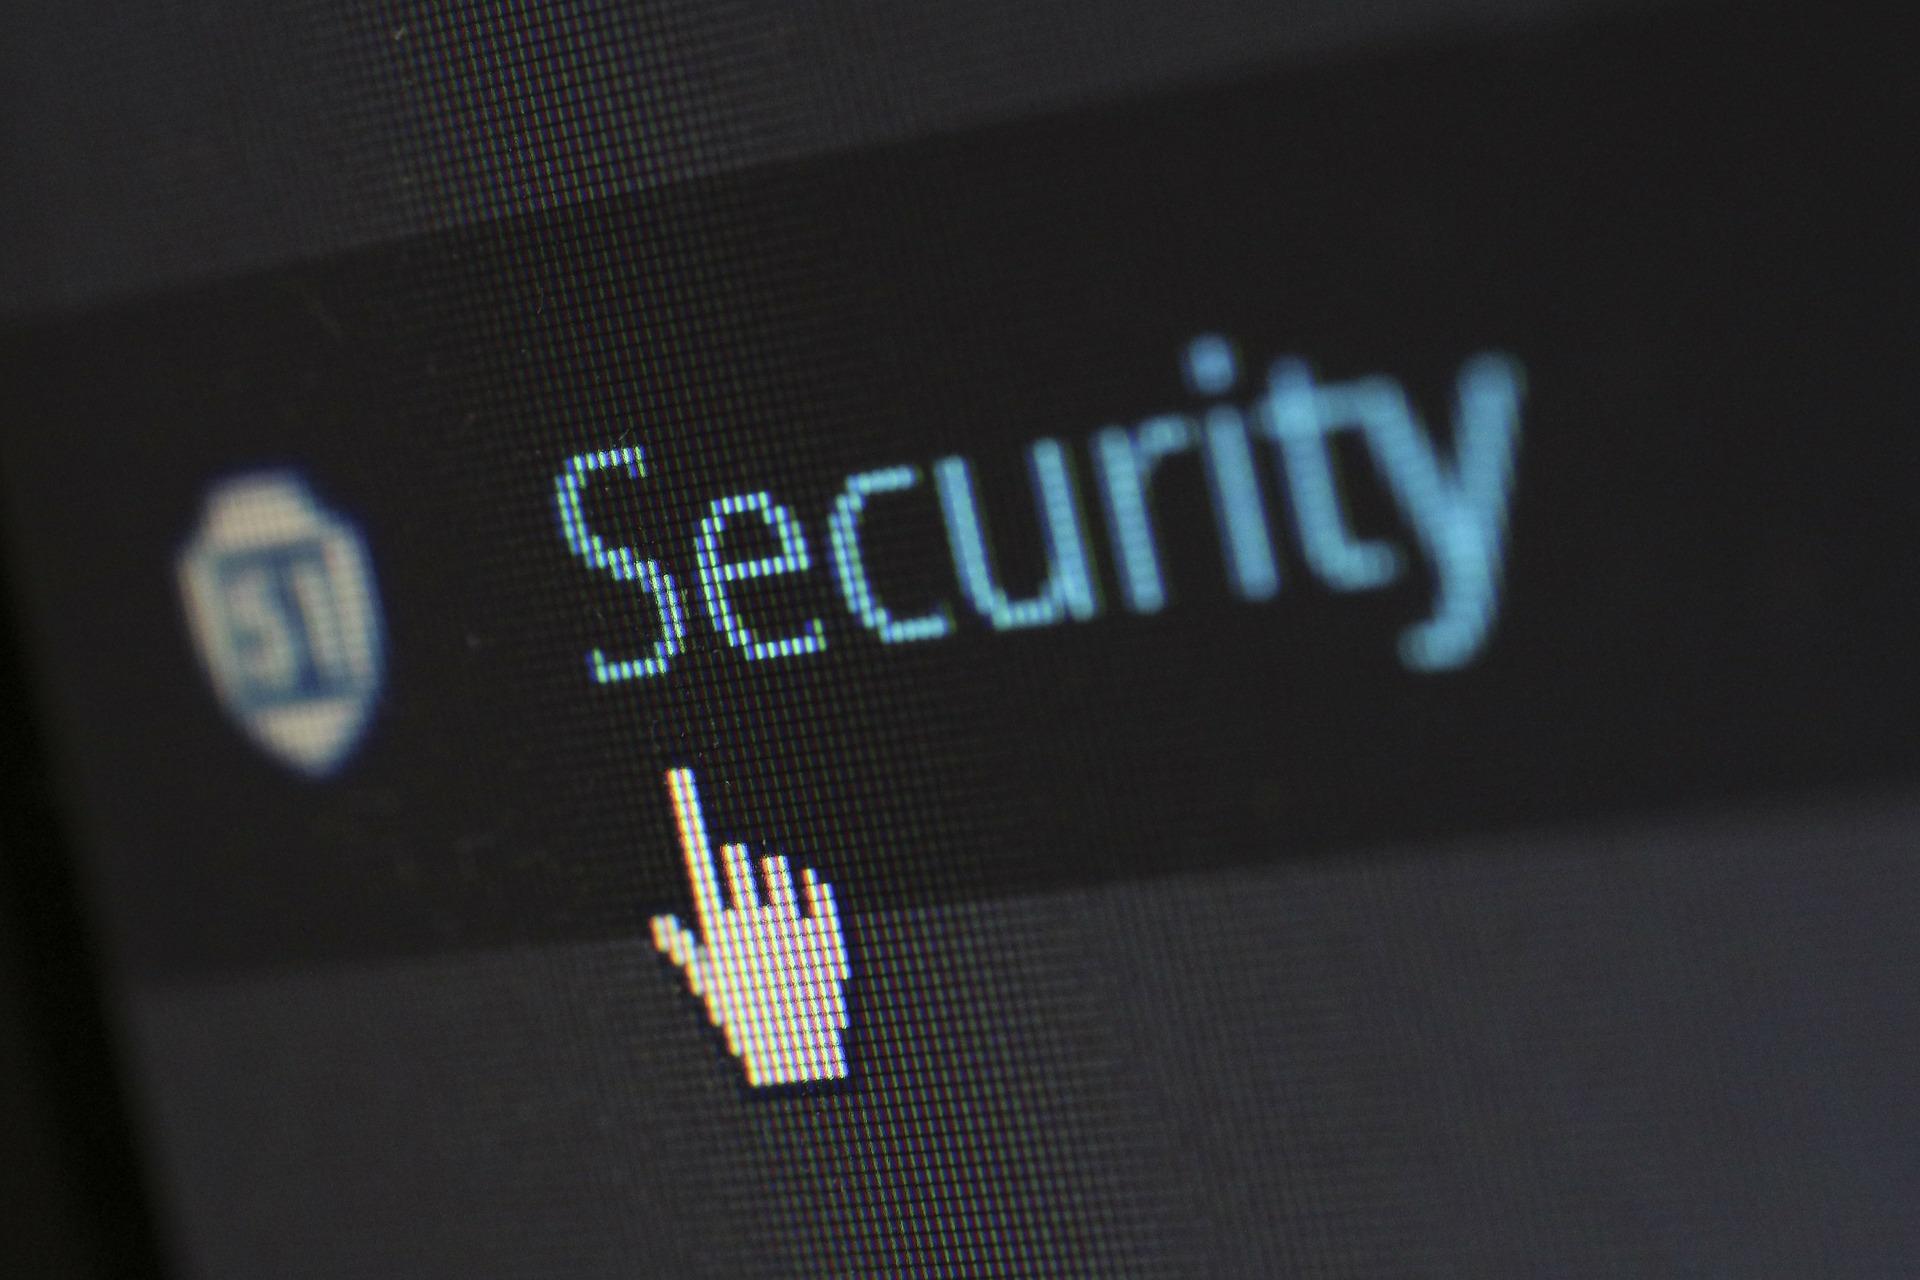 security 265130 1920 15. Juni 2021